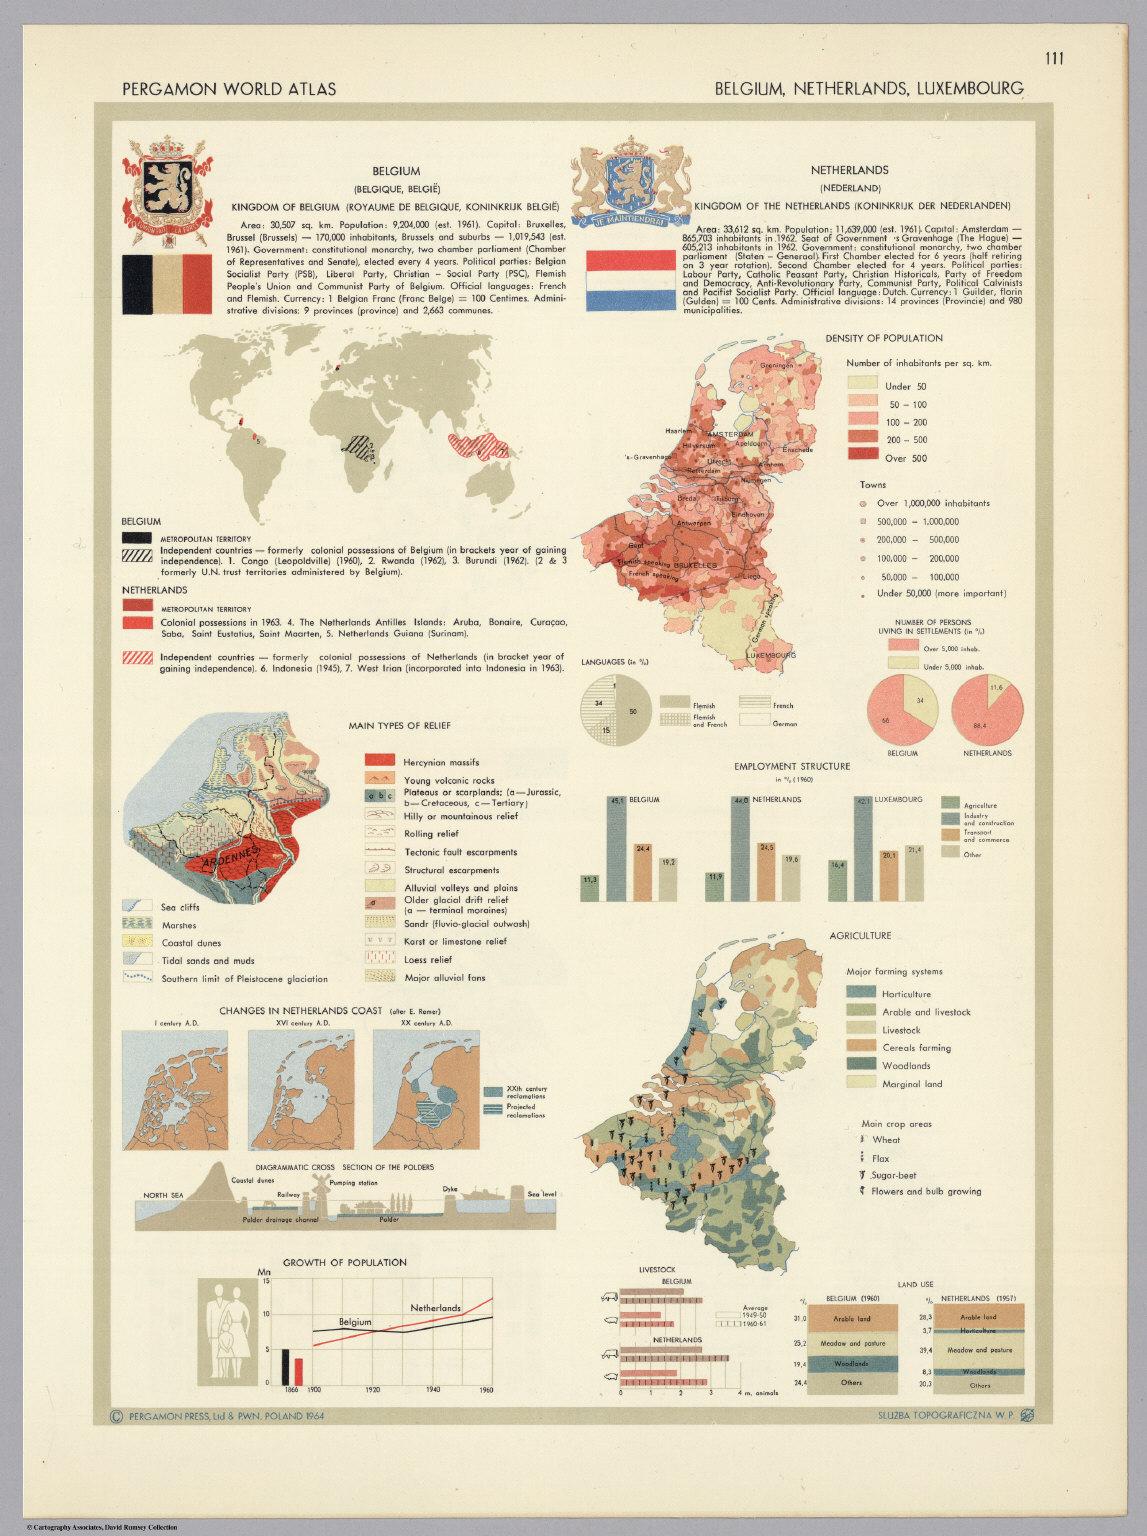 Belgium netherlands luxembourg pergamon world atlas david belgium netherlands luxembourg pergamon world atlas gumiabroncs Gallery